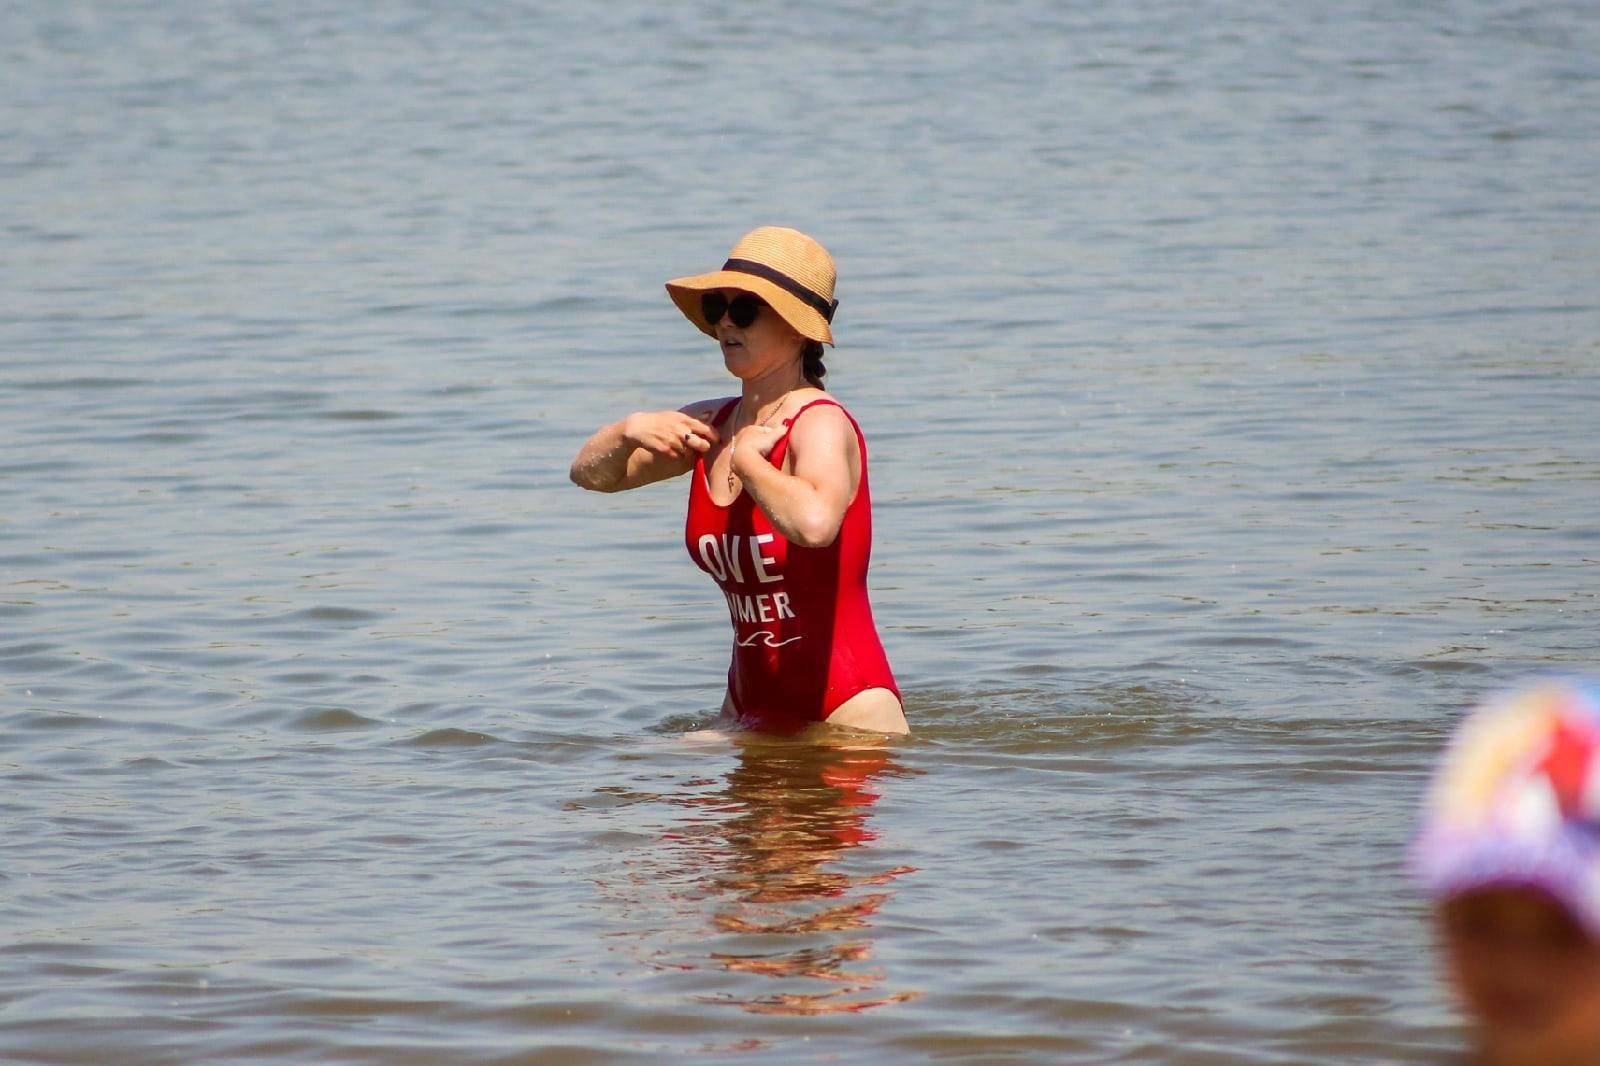 фото Бикини, селфи и горячий песок: 10 жарких фото с Бугринского пляжа в Новосибирске 7